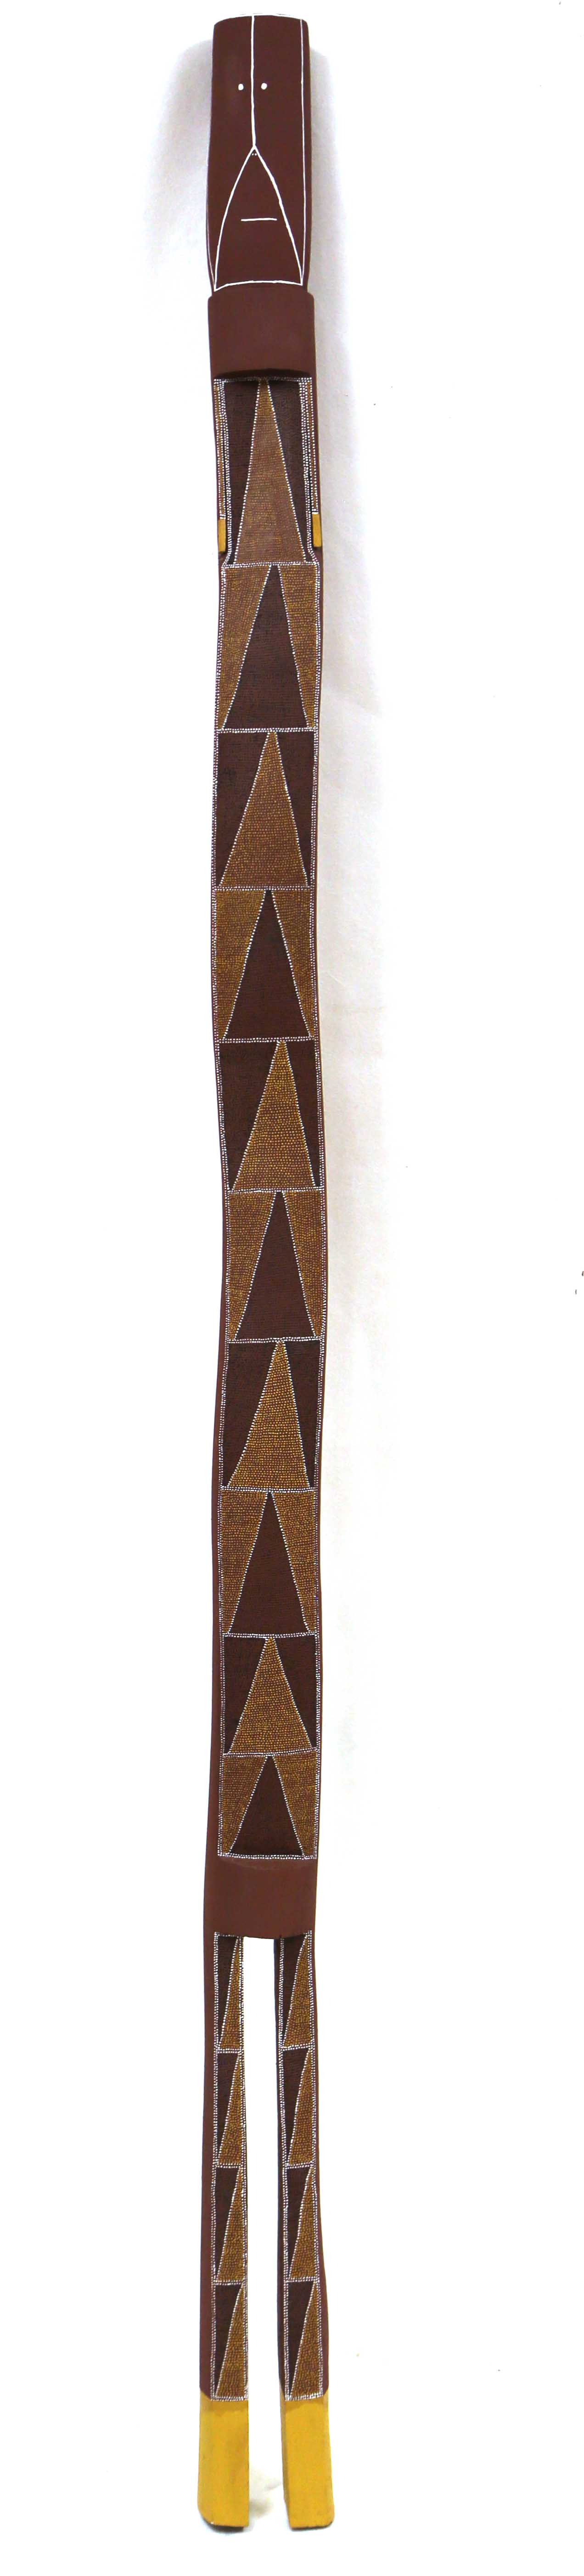 Sonia Namarnyilk  Mimih Spirit  Natural pigment on carved ironwood 176 x 10 x 6cm Maningrida Catalog #3129-18  EMAIL INQUIRY